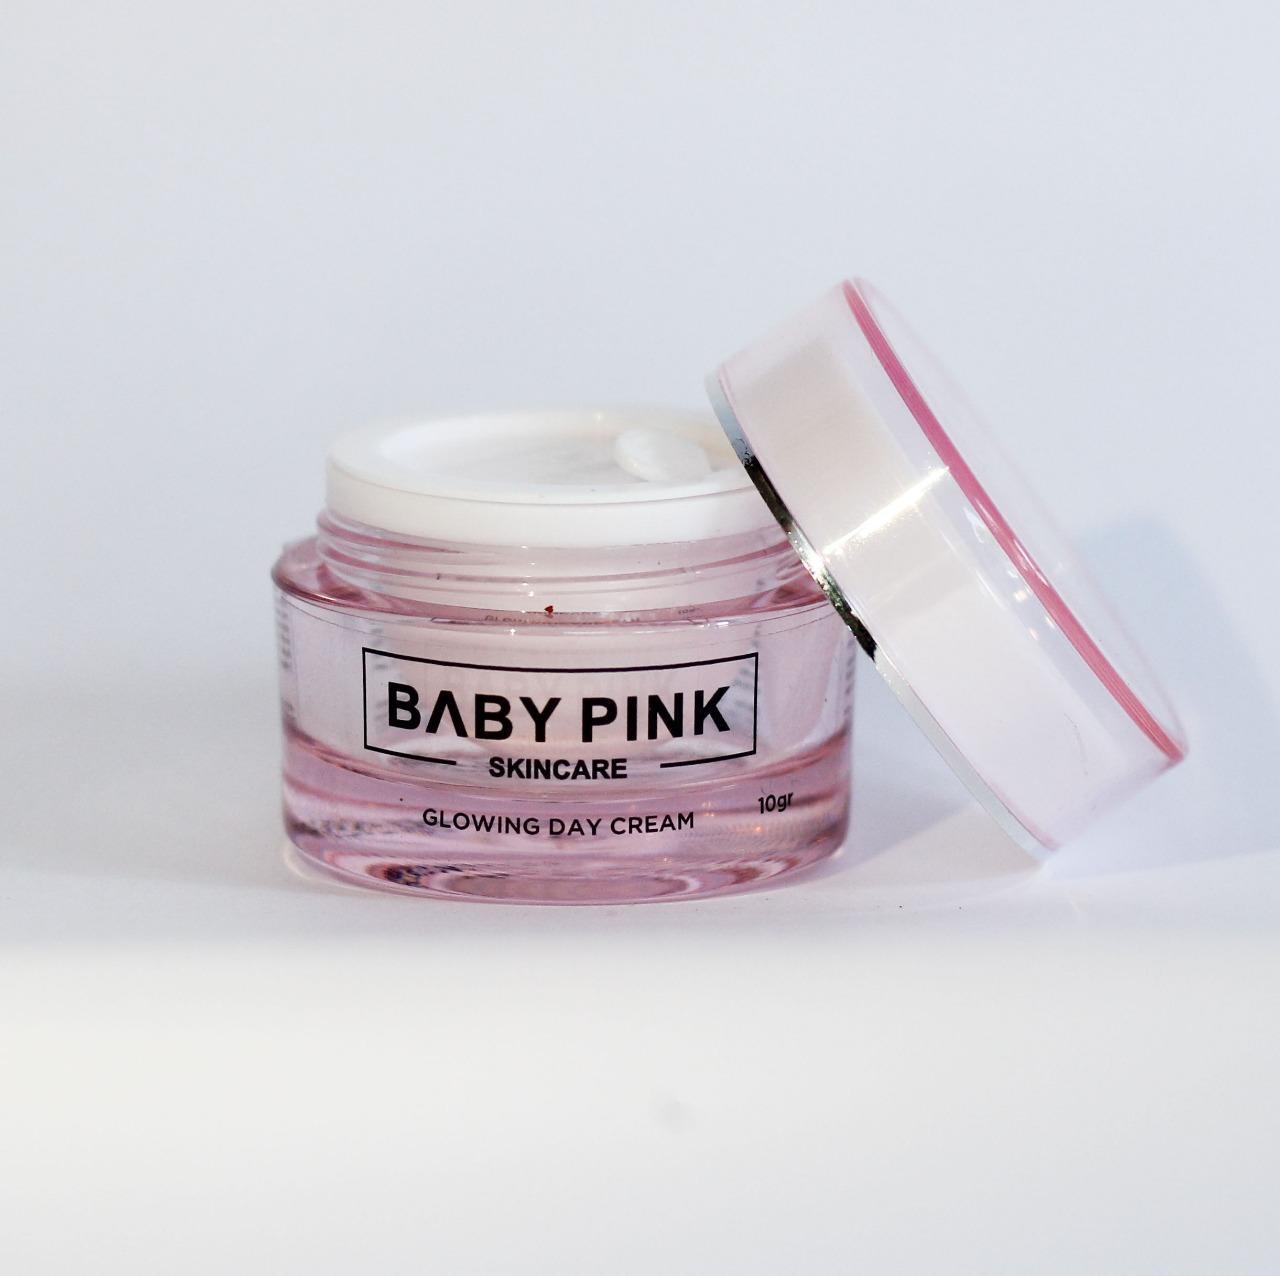 Kelebihan Promo Cream Sj Gingseng Day Ori 100 Terkini Daftar Hoshi Breast Babypink Skincare Glowing Aman Resmi Bpom